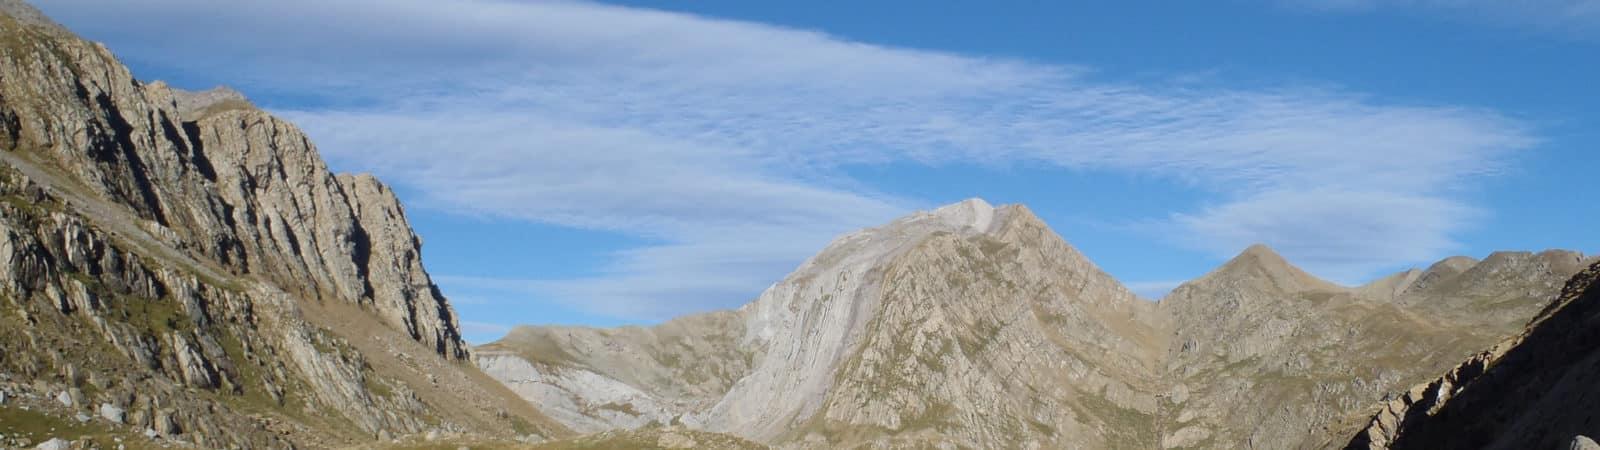 7-day Hut-to-Hut Trek along the La Senda de Camille